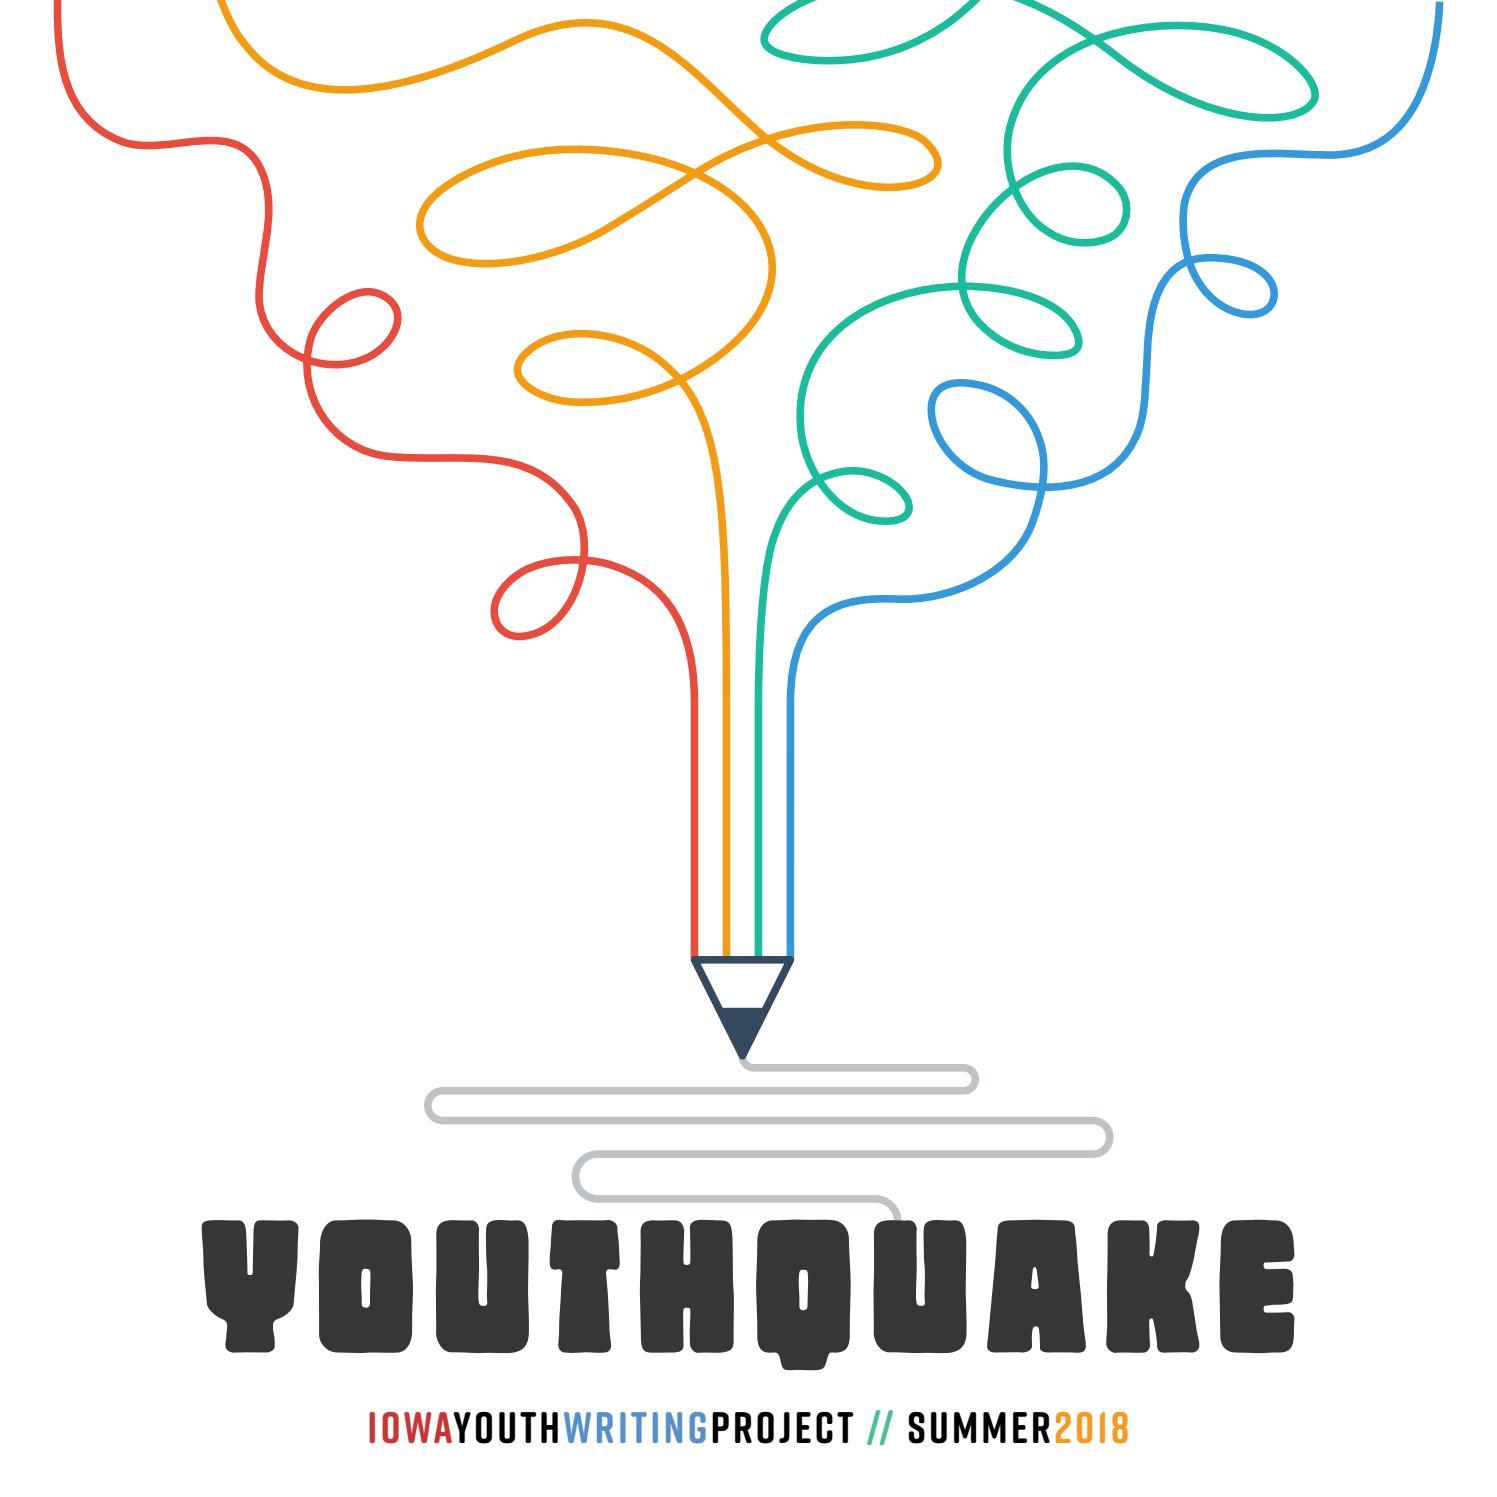 YOUTHQUAKE, vol. 1